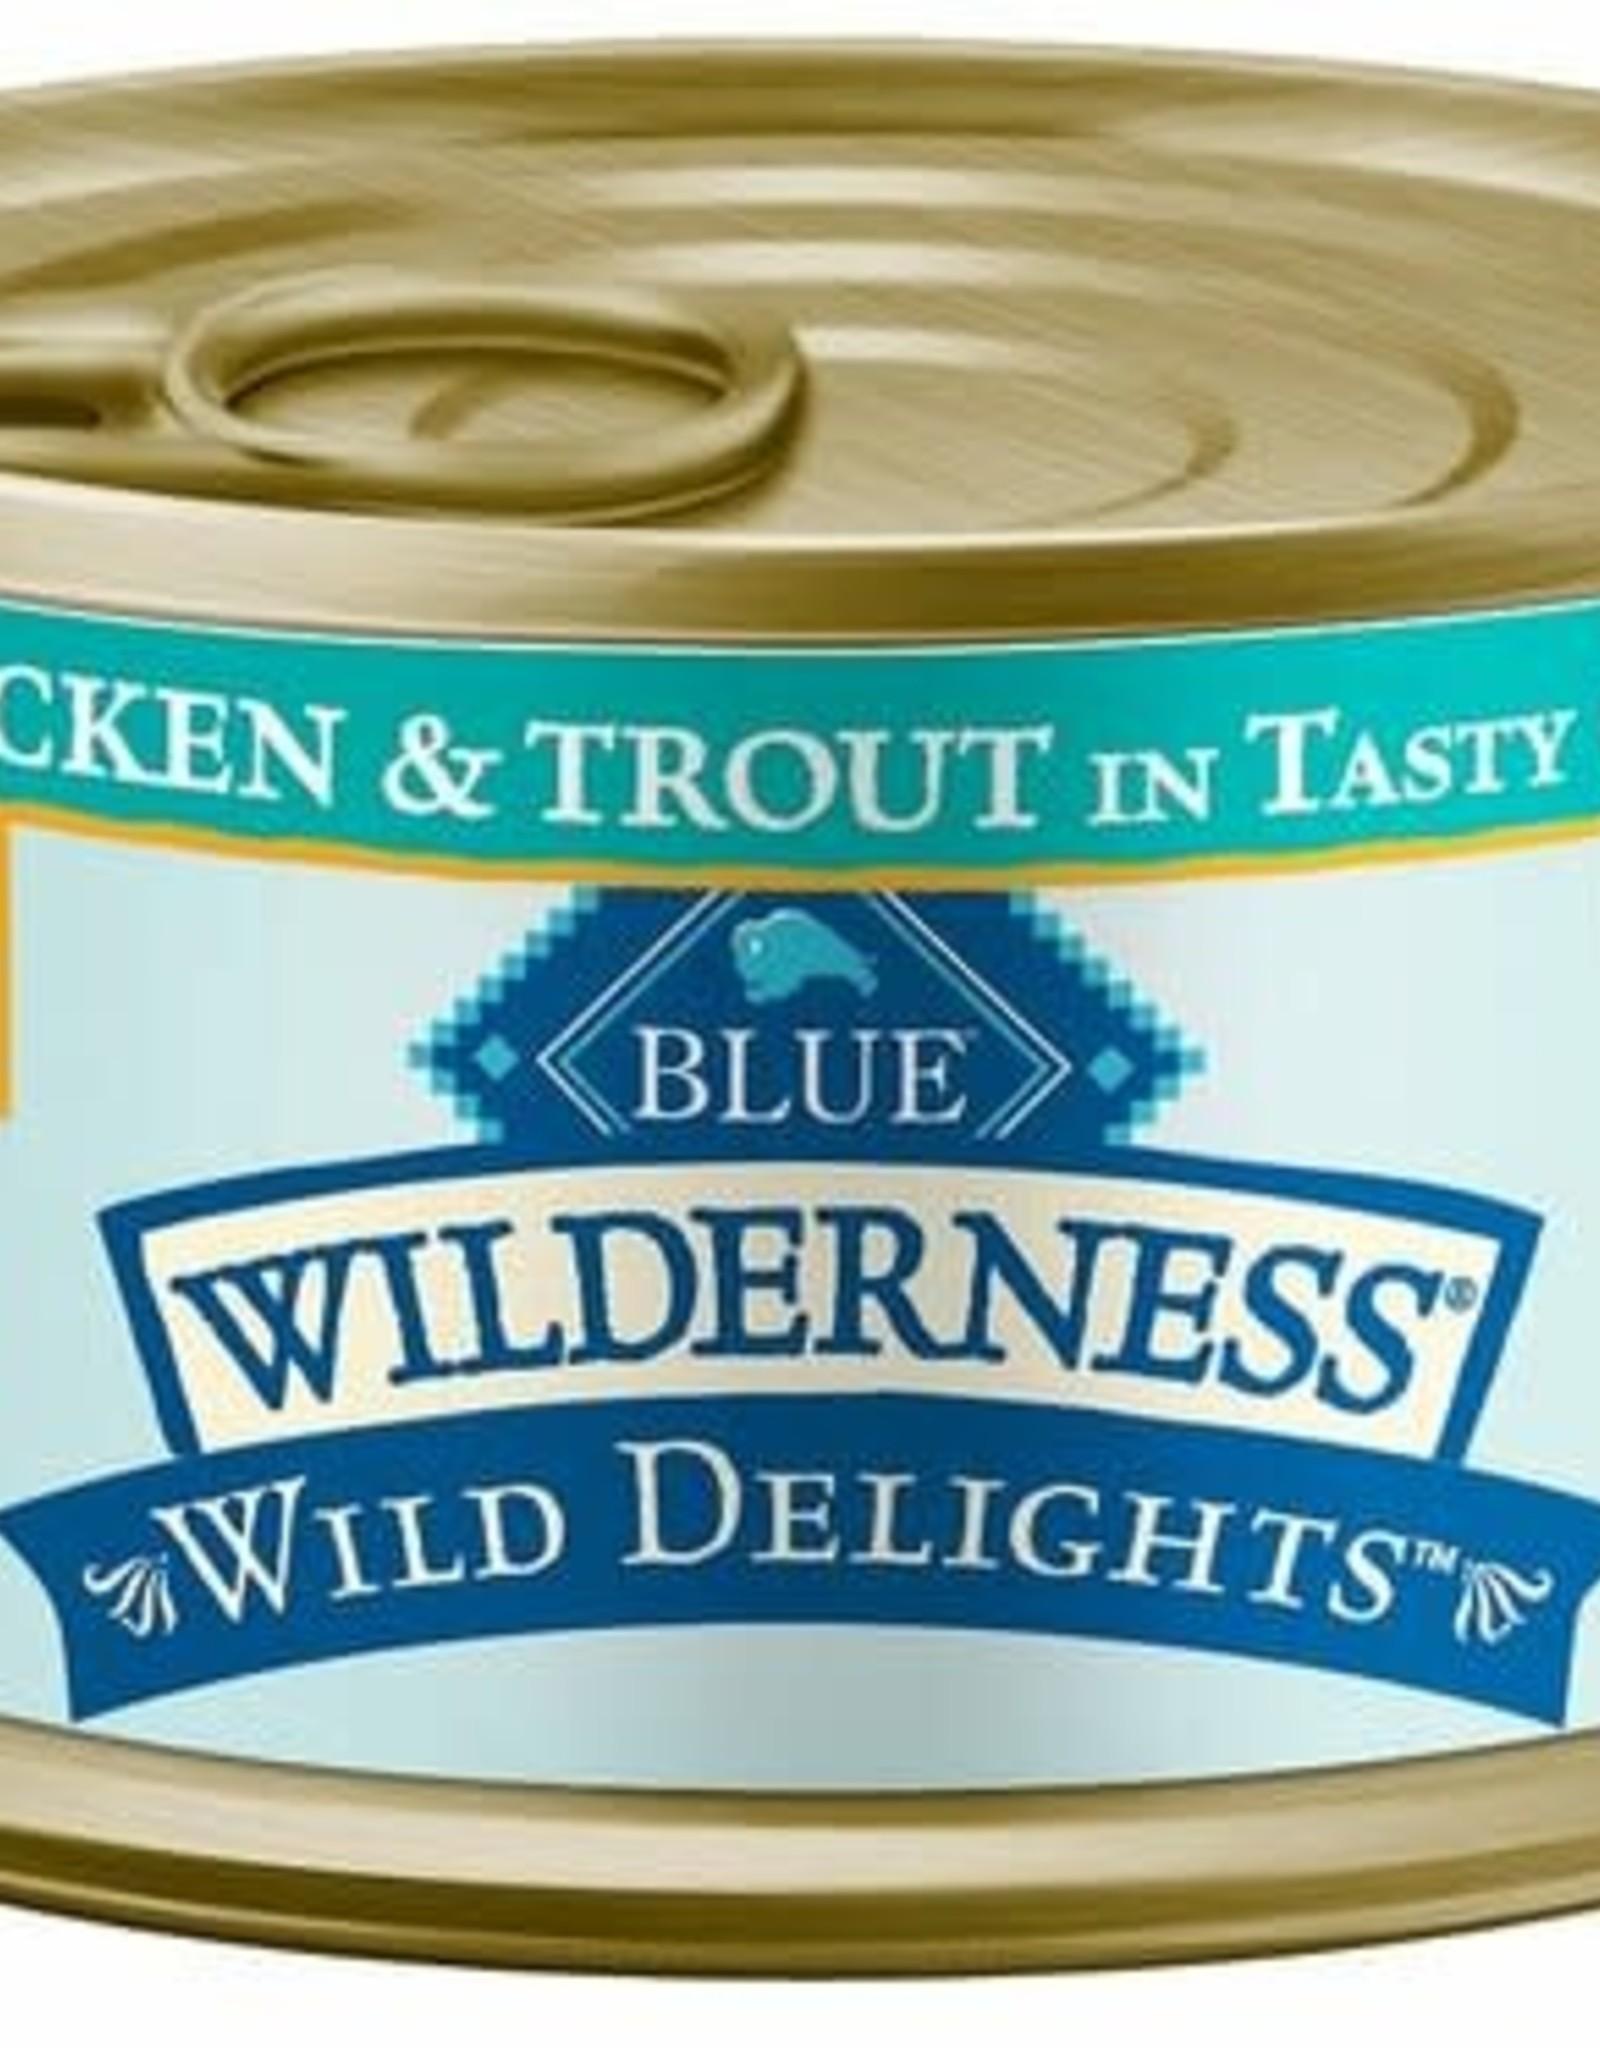 Blue Buffalo Blue Buffalo Cat Wilderness Delight Flaked Chicken & Trout - 3 oz can